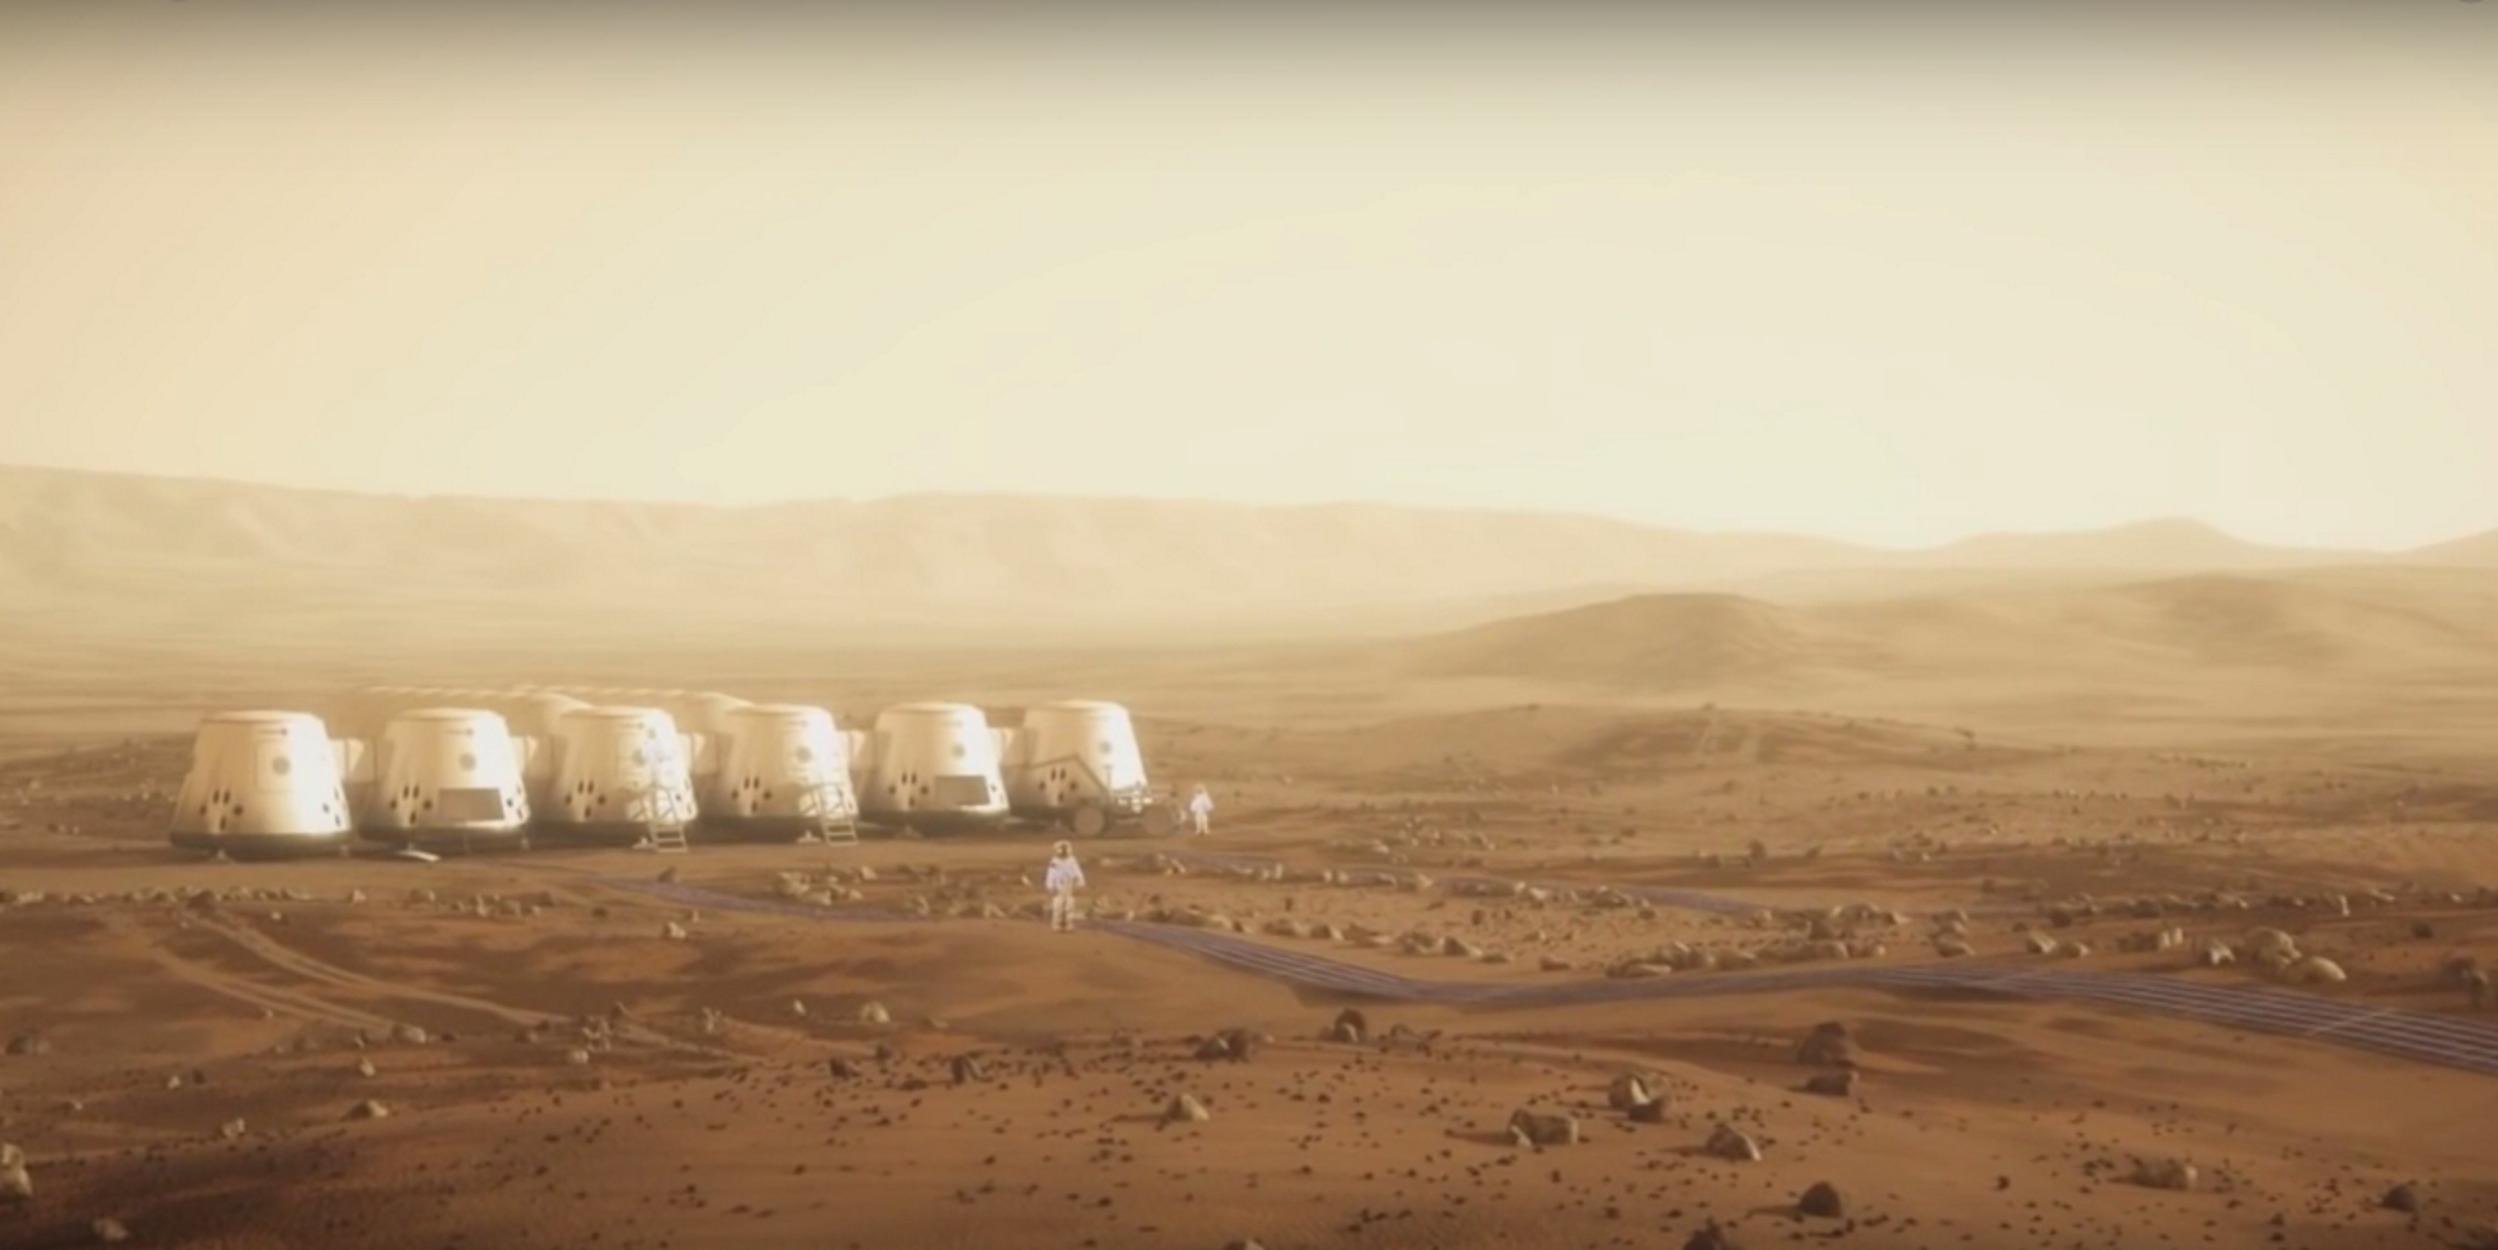 Moving to Mars – Έτσι θα επιβιώσετε στον πλανήτη Άρη! video